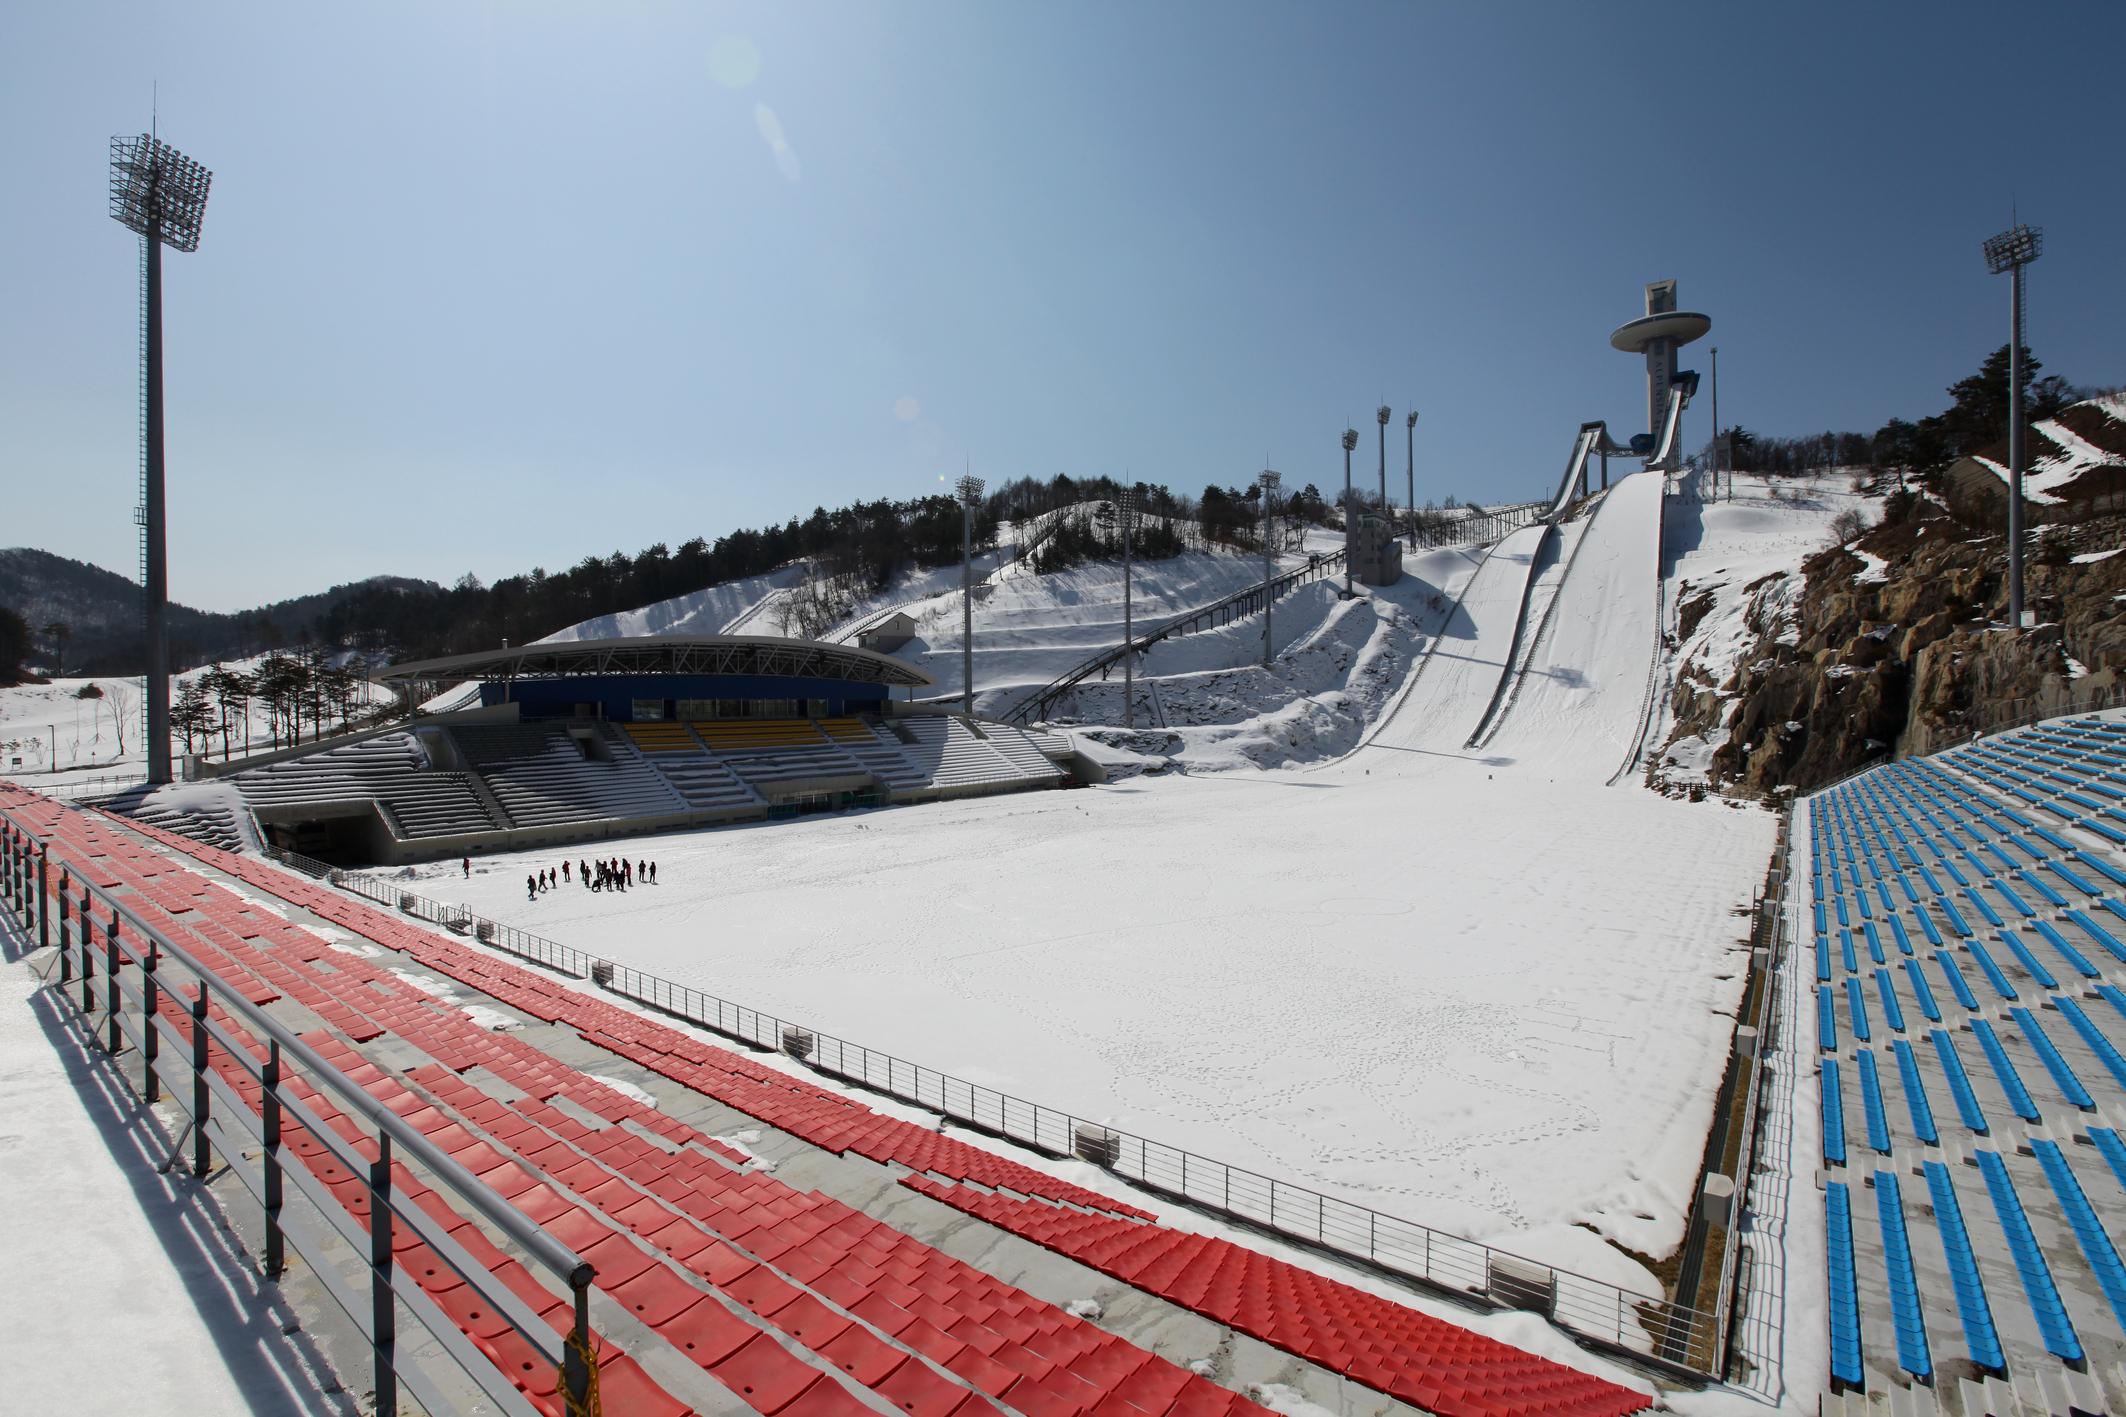 3312021201203046k_Alpensia Ski Resort